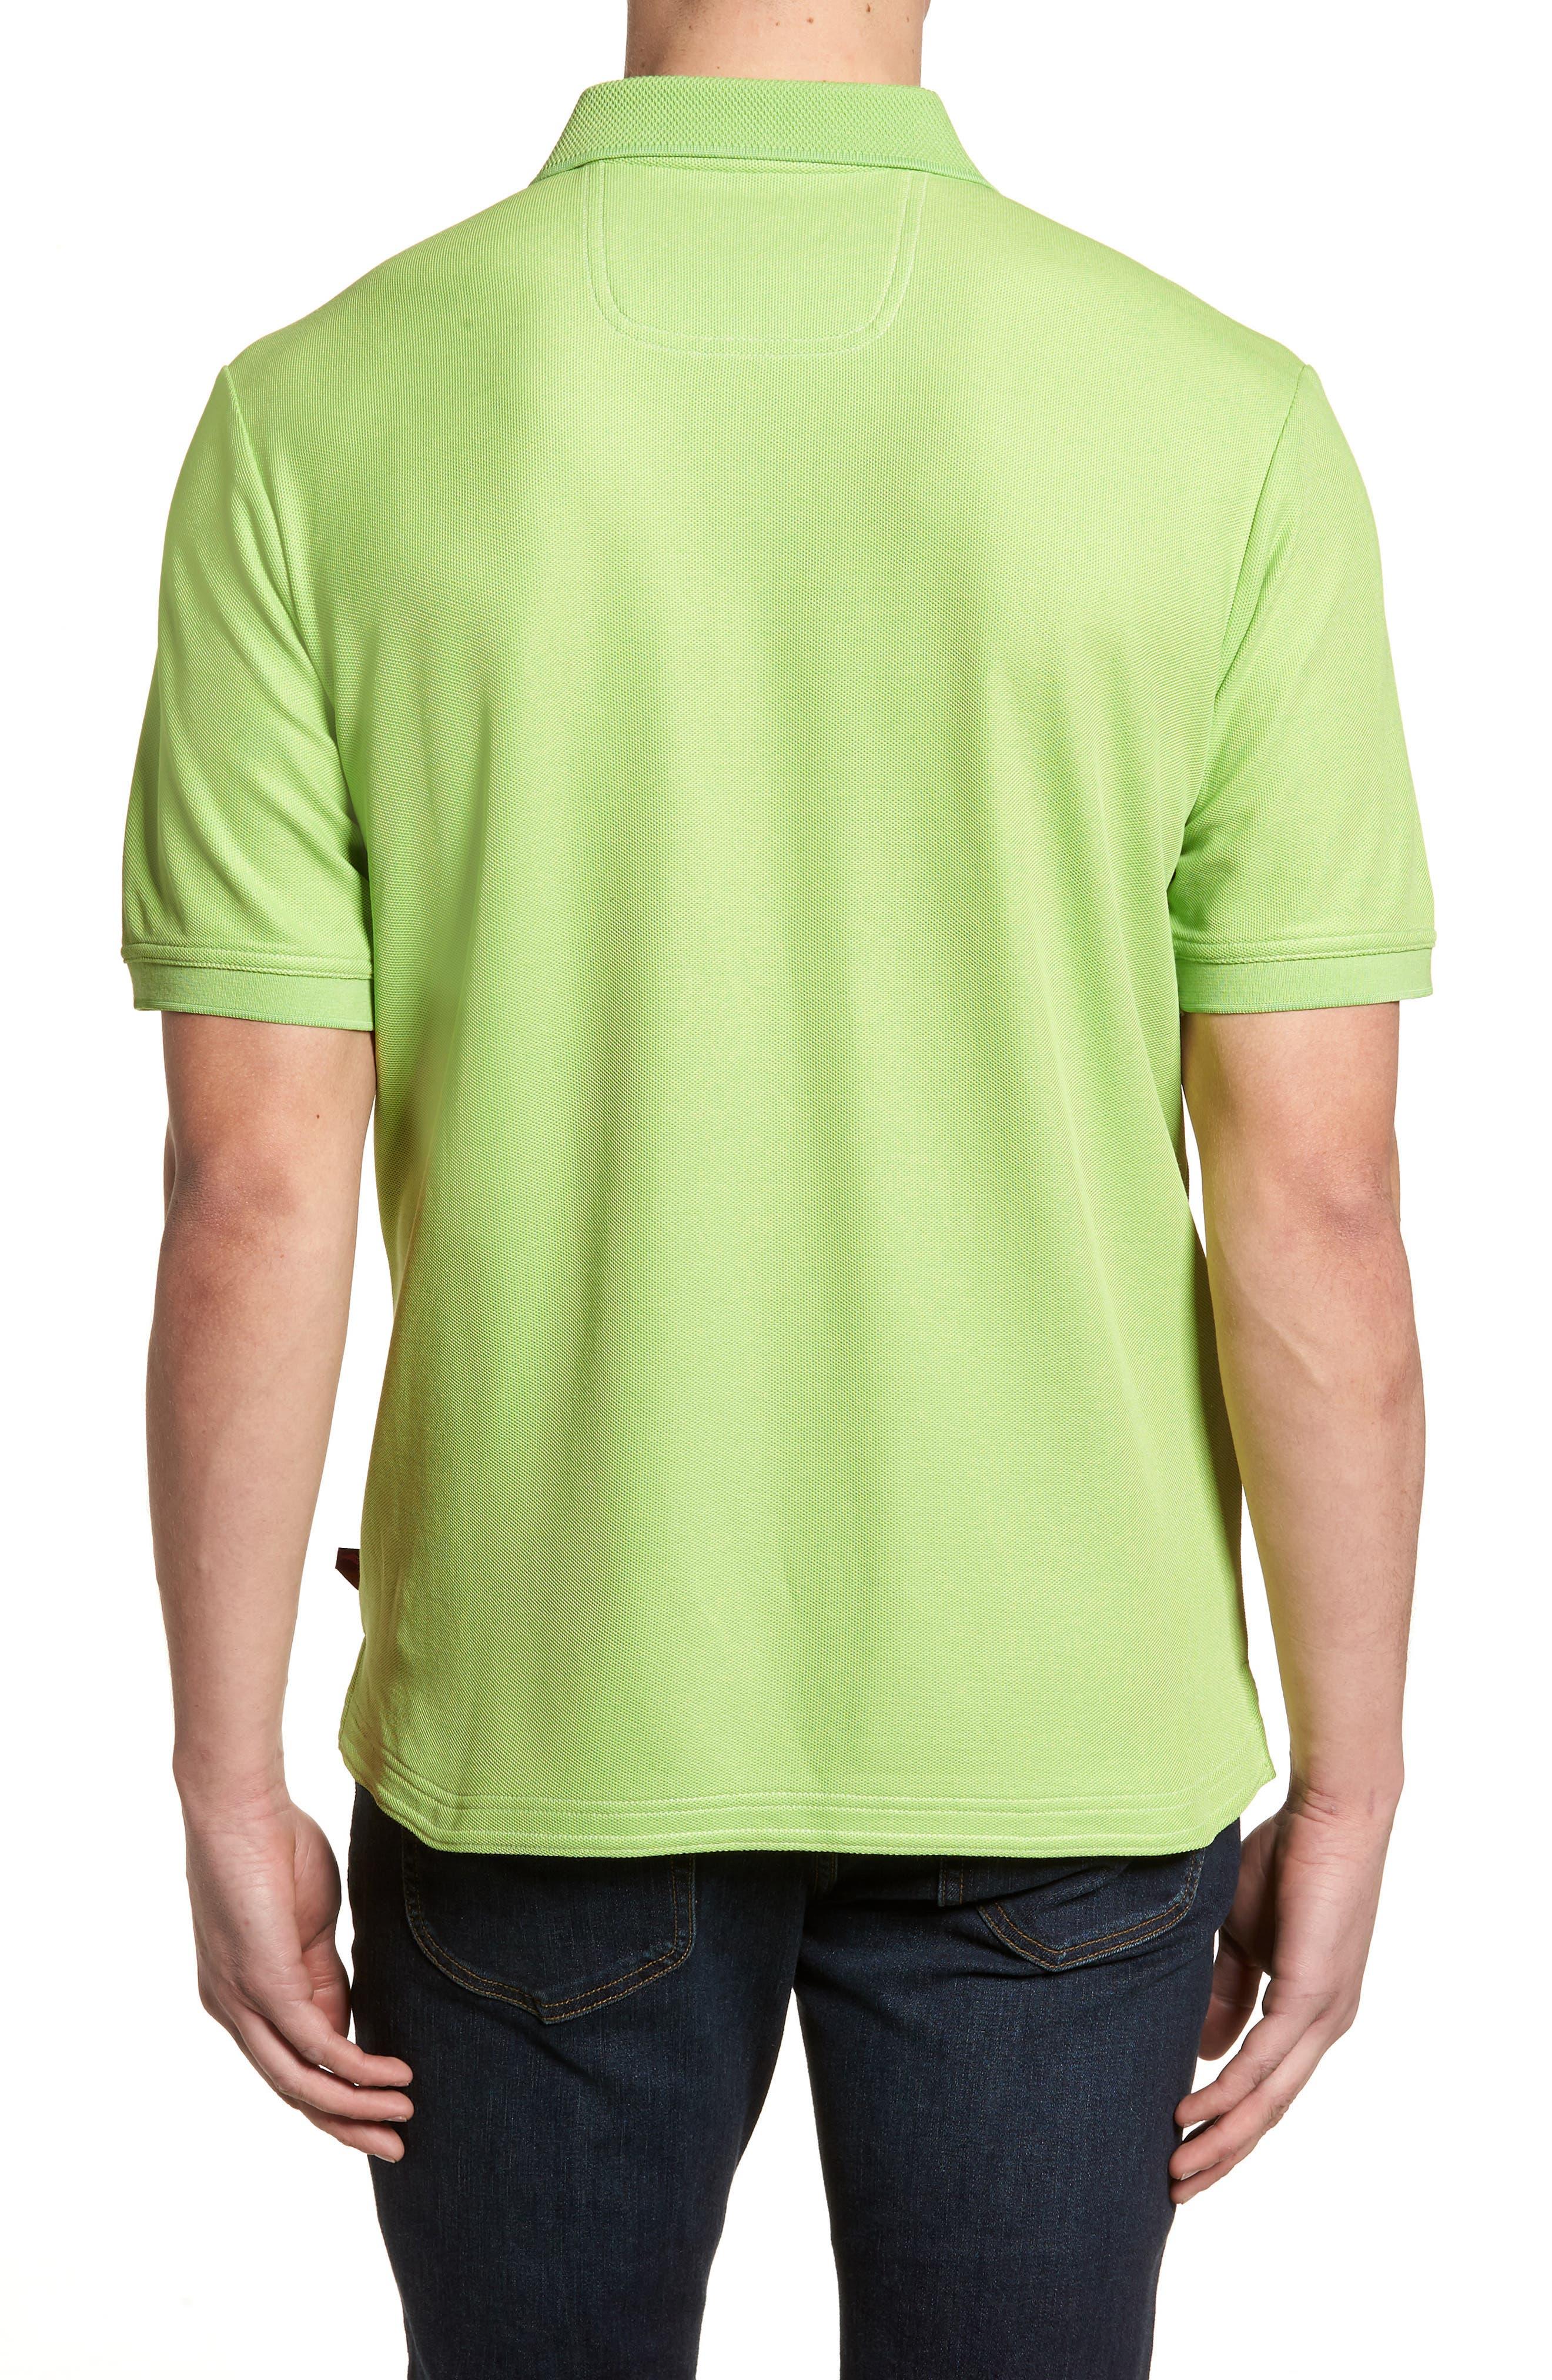 'The Emfielder' Original Fit Piqué Polo,                             Alternate thumbnail 2, color,                             Caicos Green